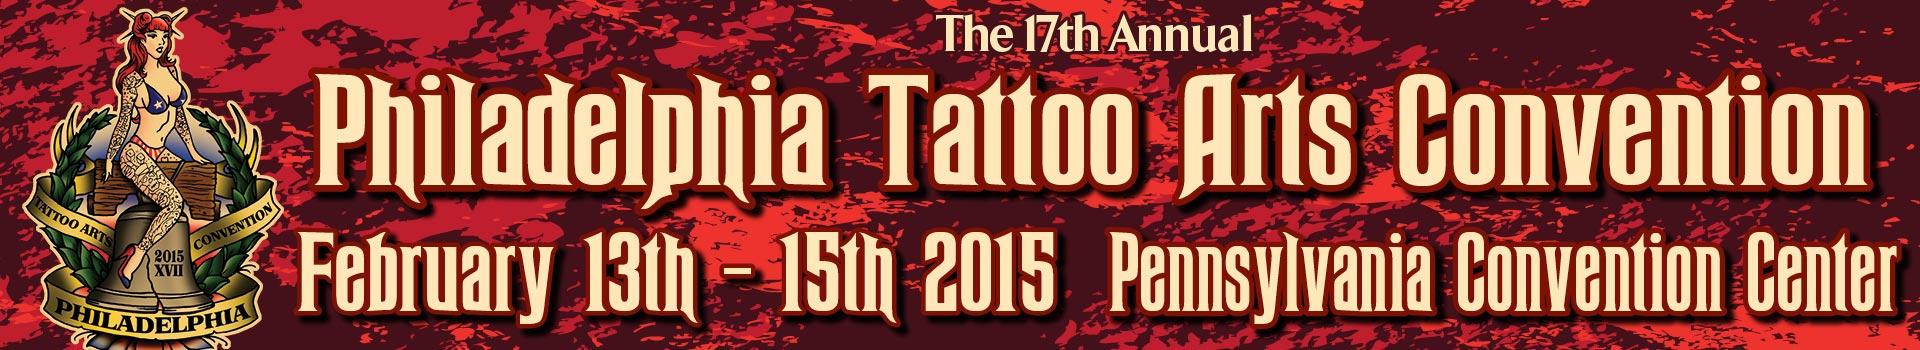 Philadelphia Tattoo Convention